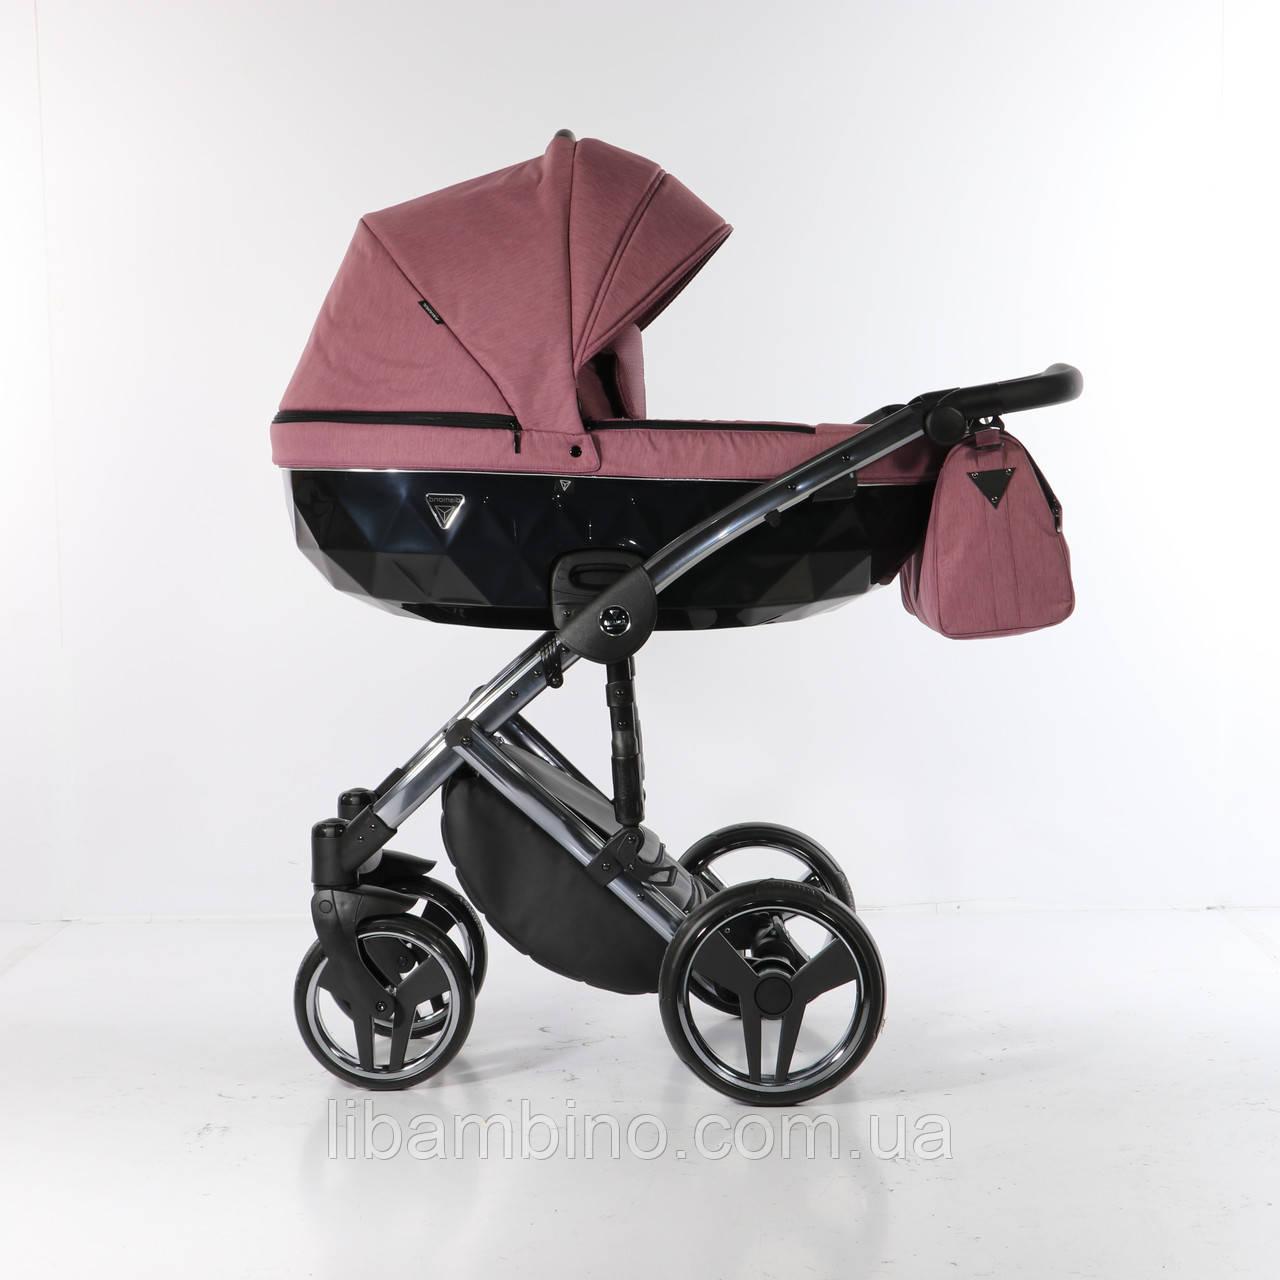 Дитяча універсальна коляска 2 в 1 Junama Saphire 04